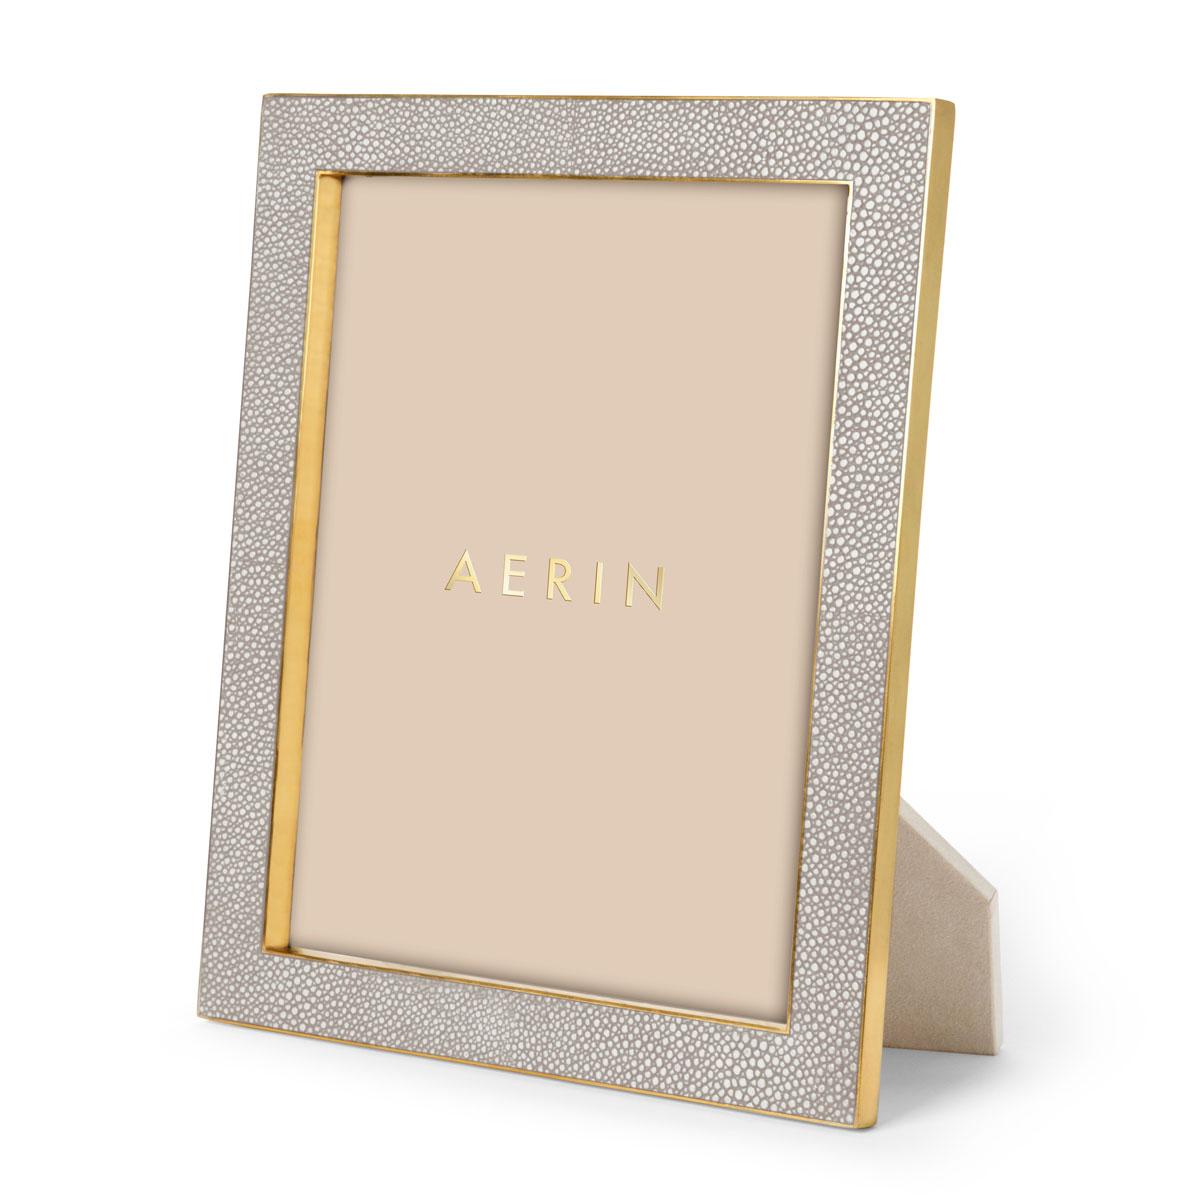 "Aerin Classic Shagreen Frame, Dove 8x10"""